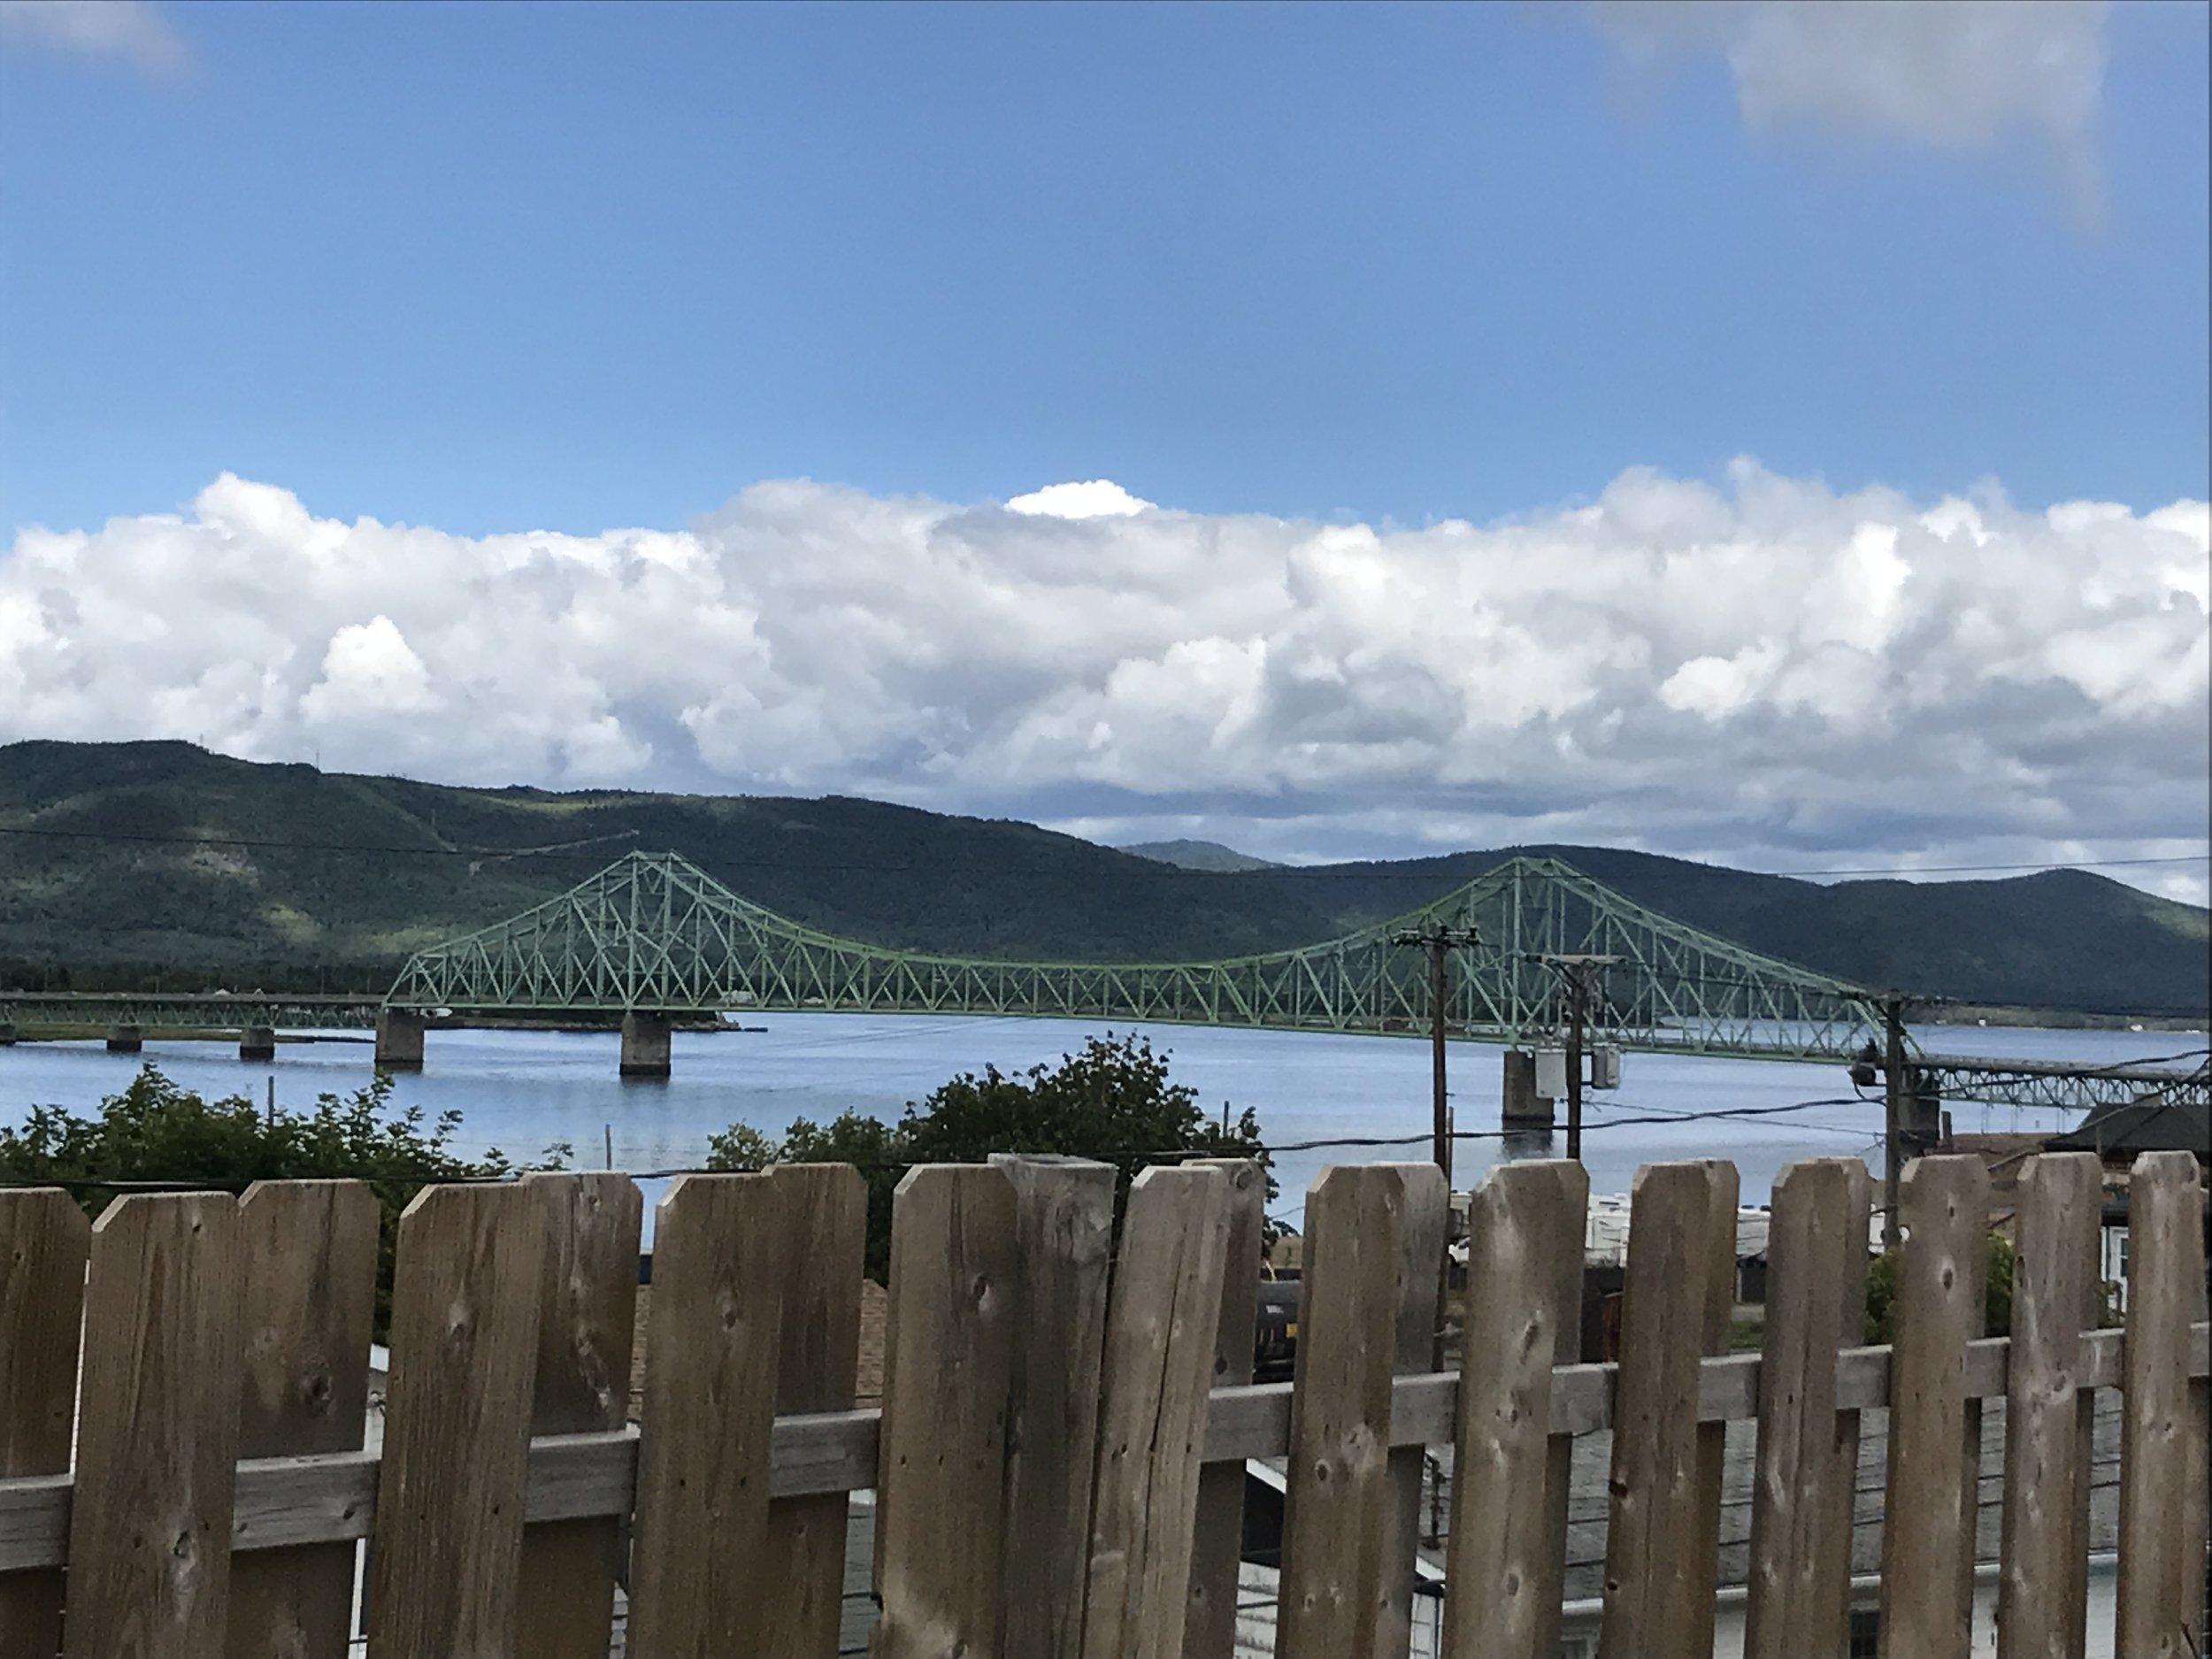 The bridge in Campbellton that links New-Brunswick to Gaspésie, Québec.